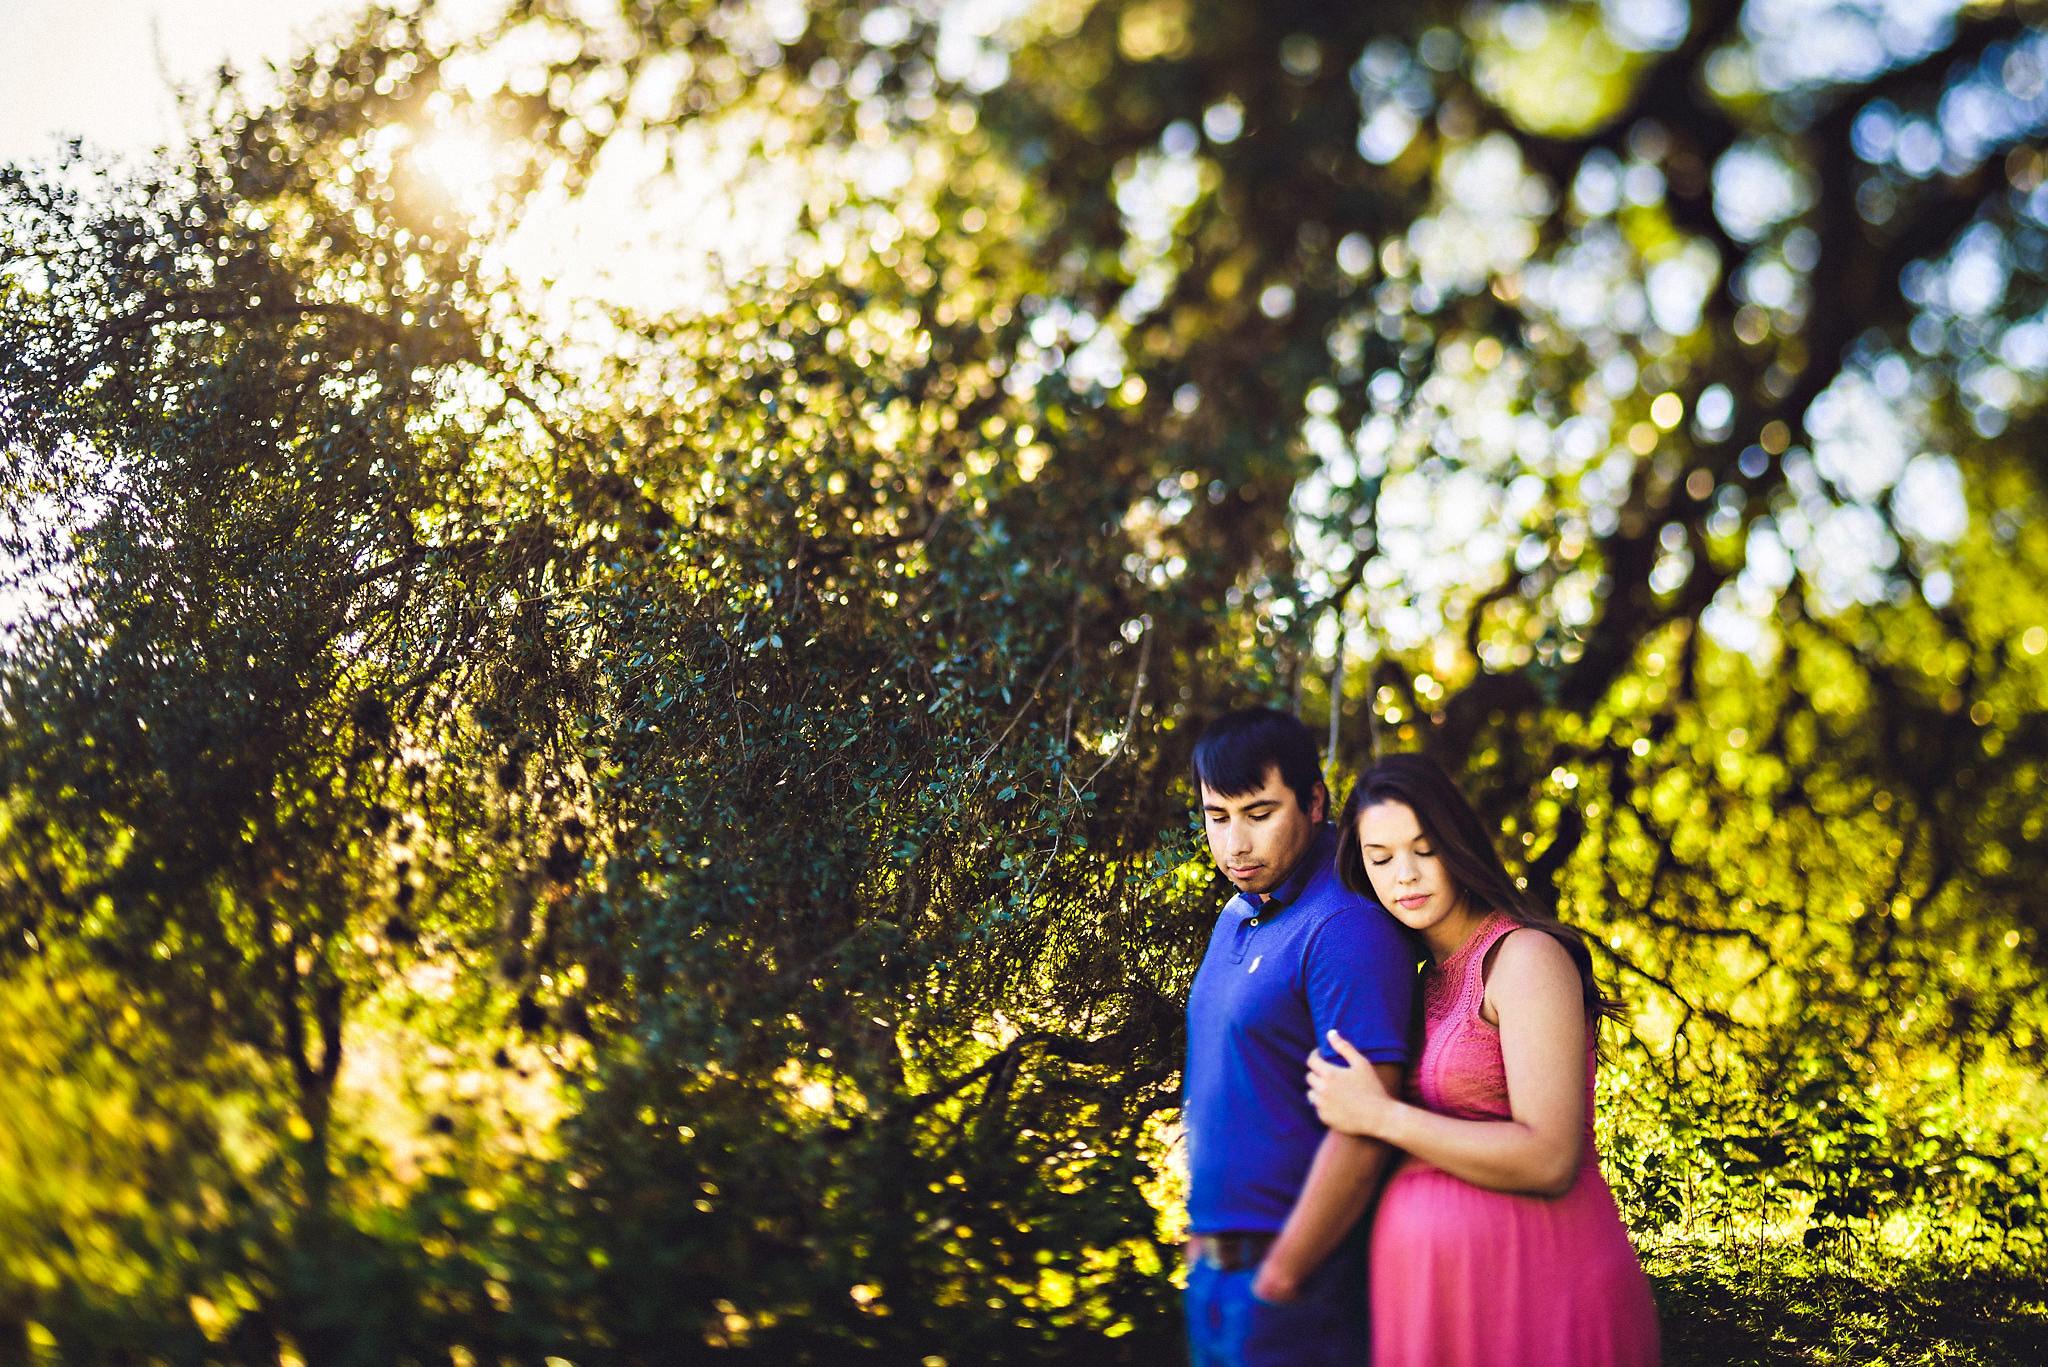 Eirik Halvorsen Austin Texas maternity photographer-2.jpg